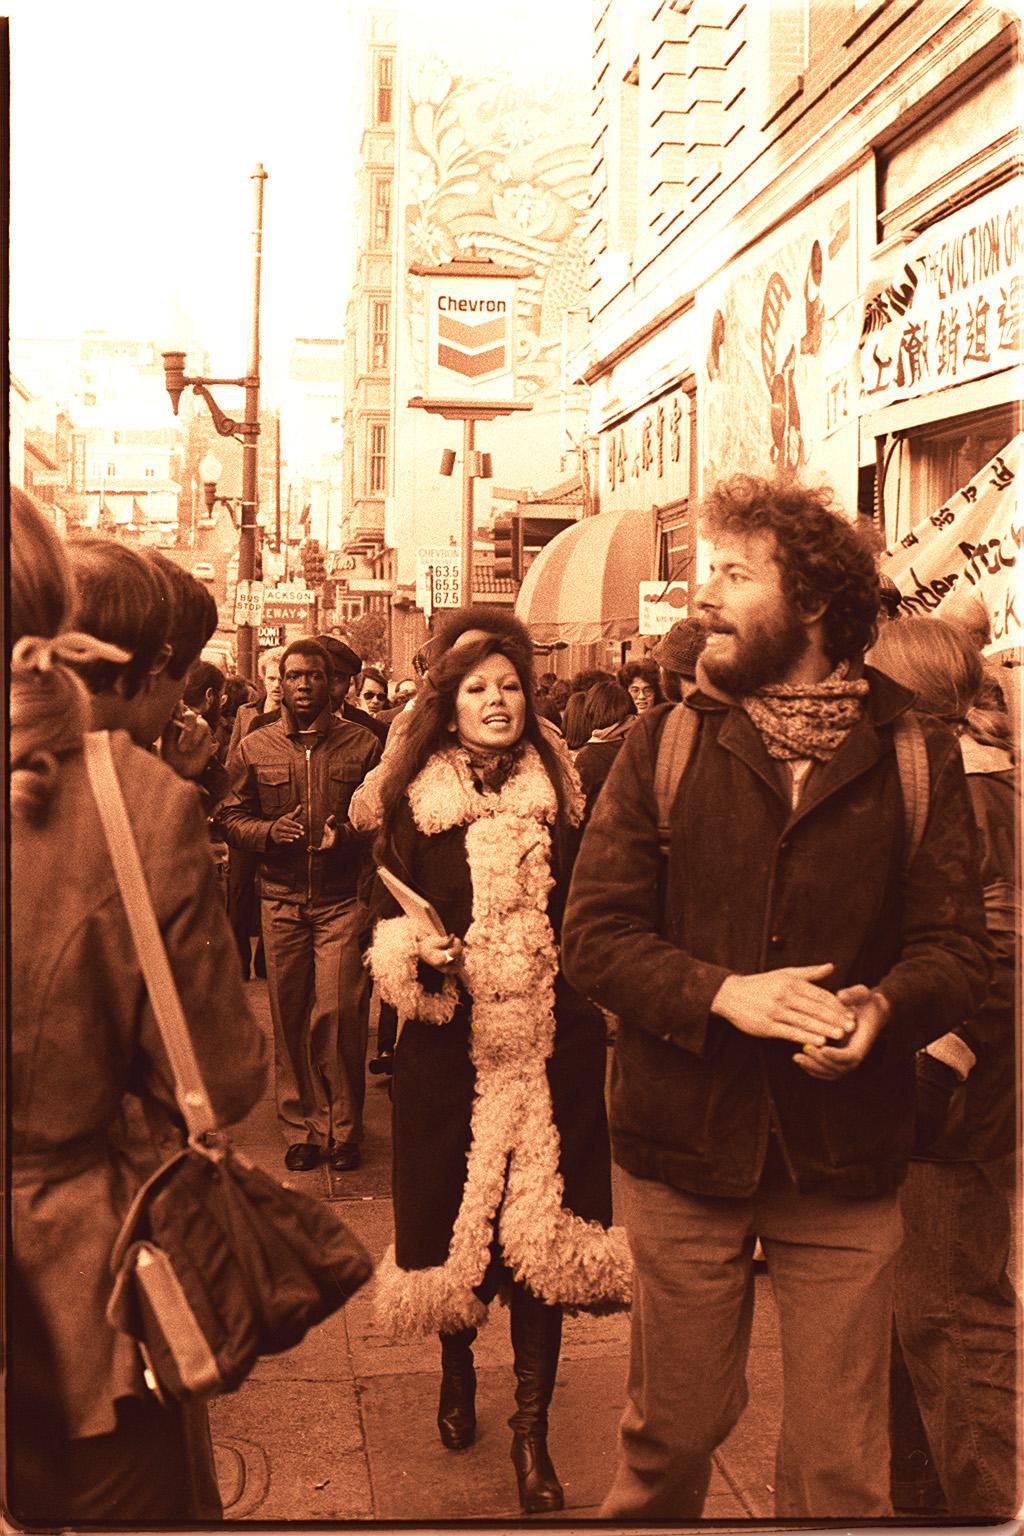 1977 — Janice Mirikitani at San Francisco eviction protest | © Nancy Wong/WikiCommons